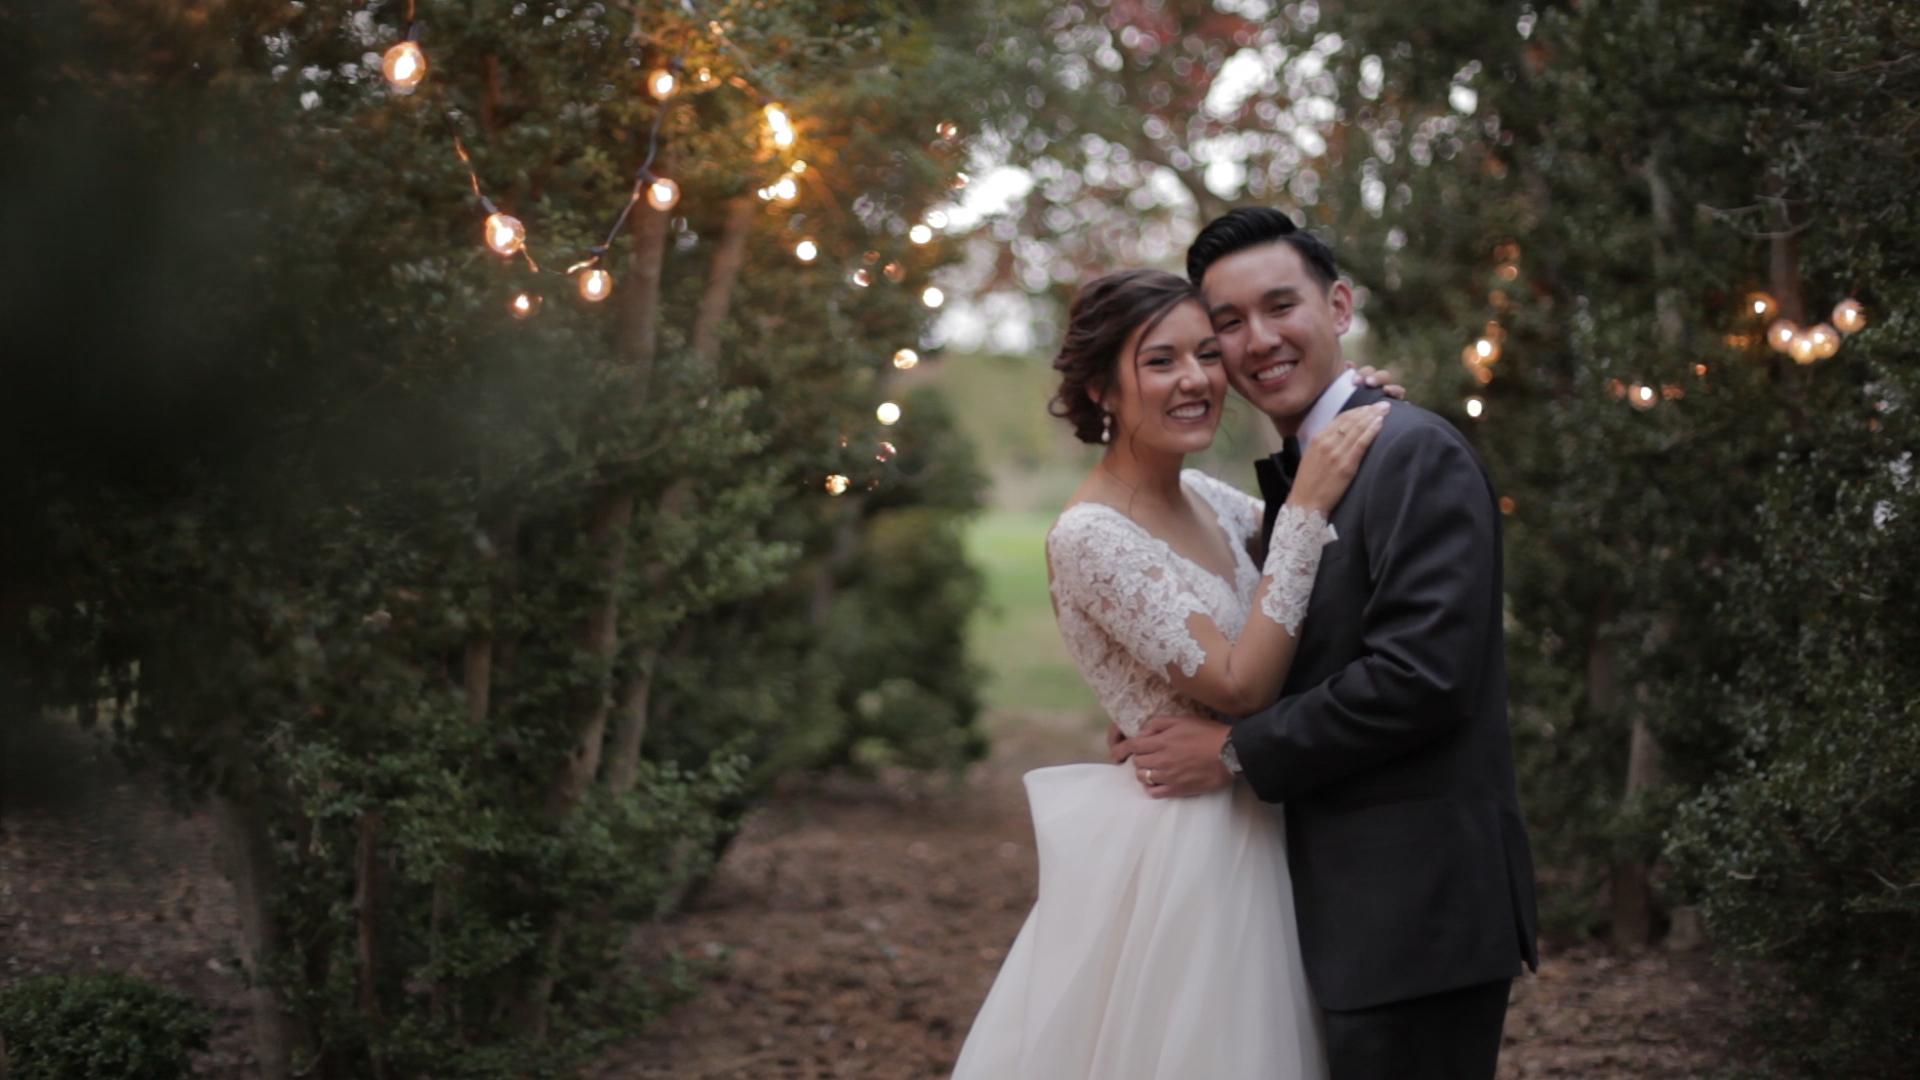 Caitlin & Daniel